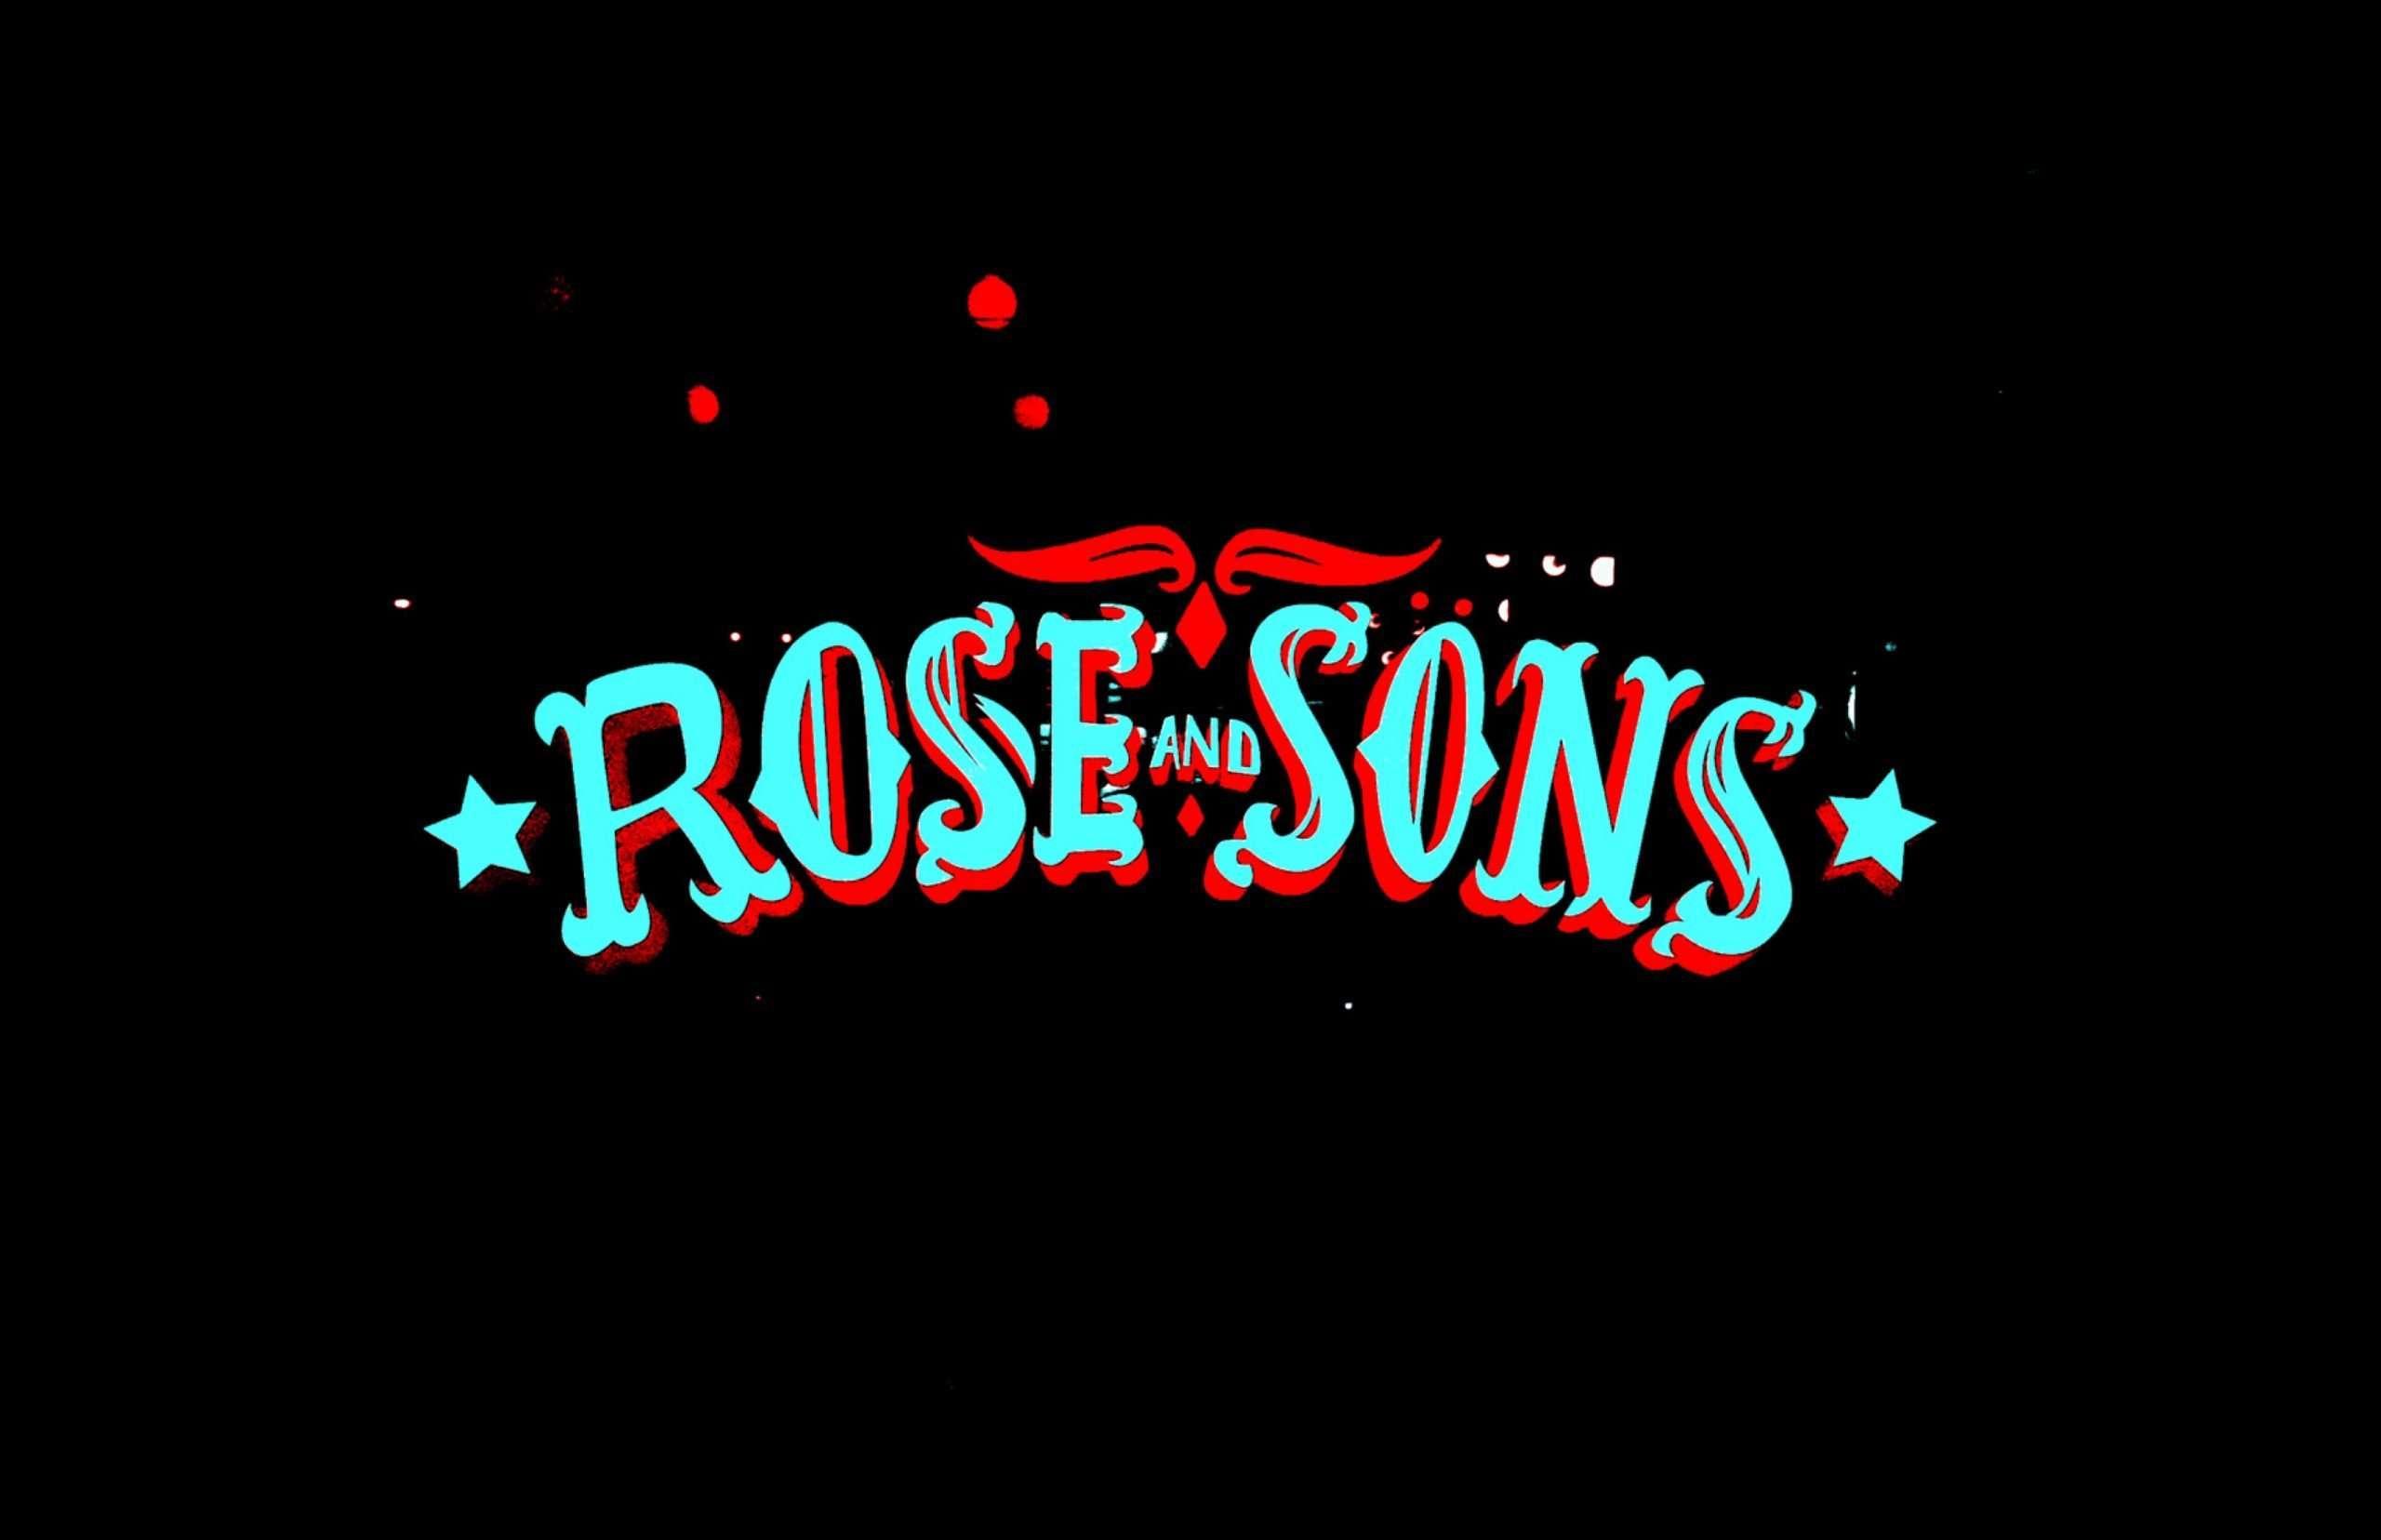 Rose & Sons